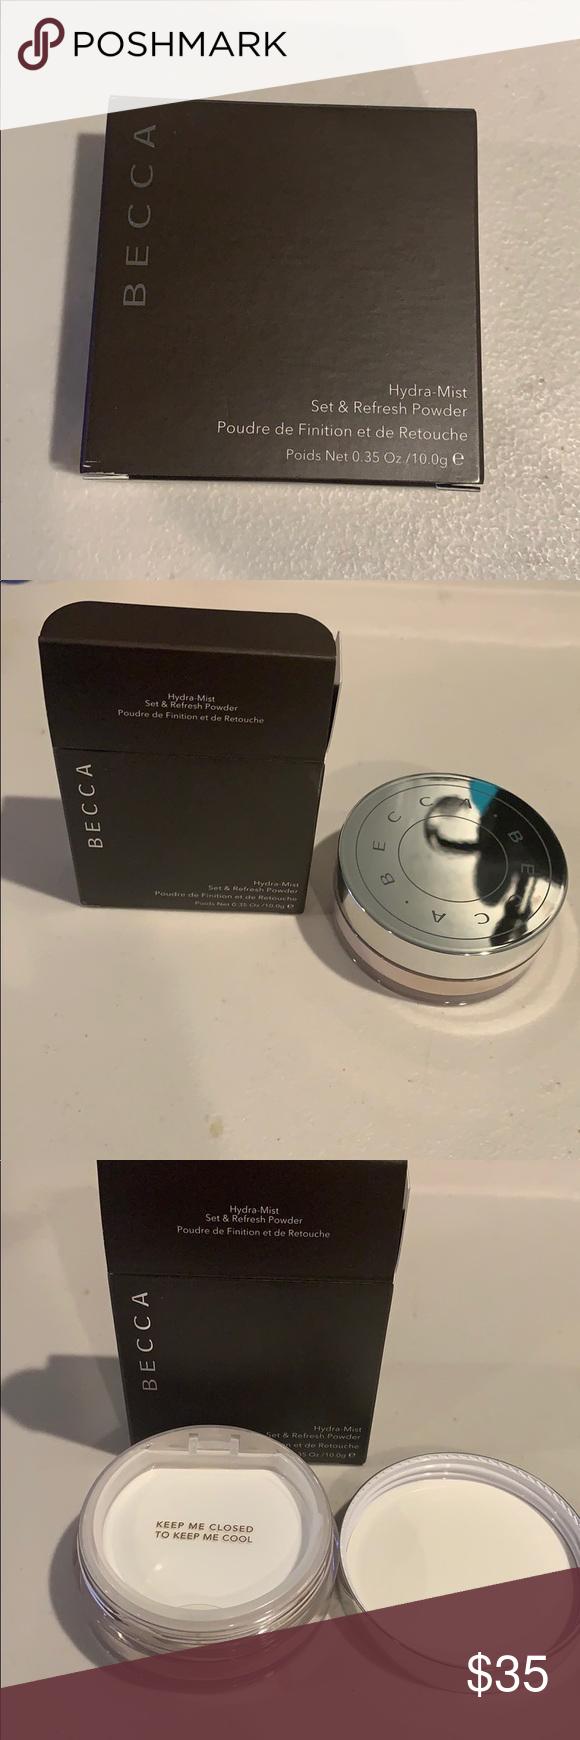 Becca Hydra-mist powder BRAND NEW‼️ In original packaging ...